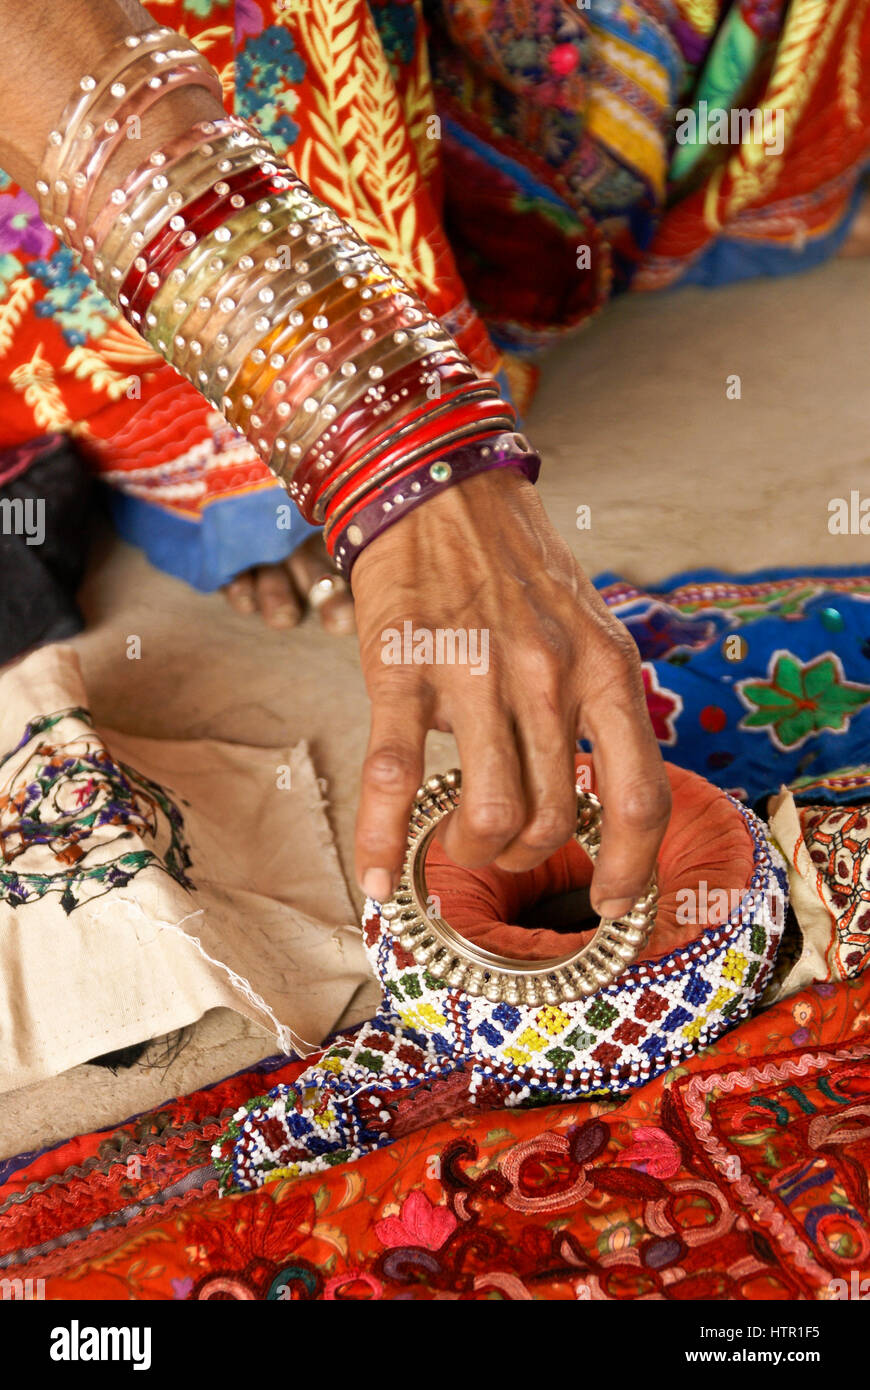 Handicrafts Gujarat Stock Photos Handicrafts Gujarat Stock Images